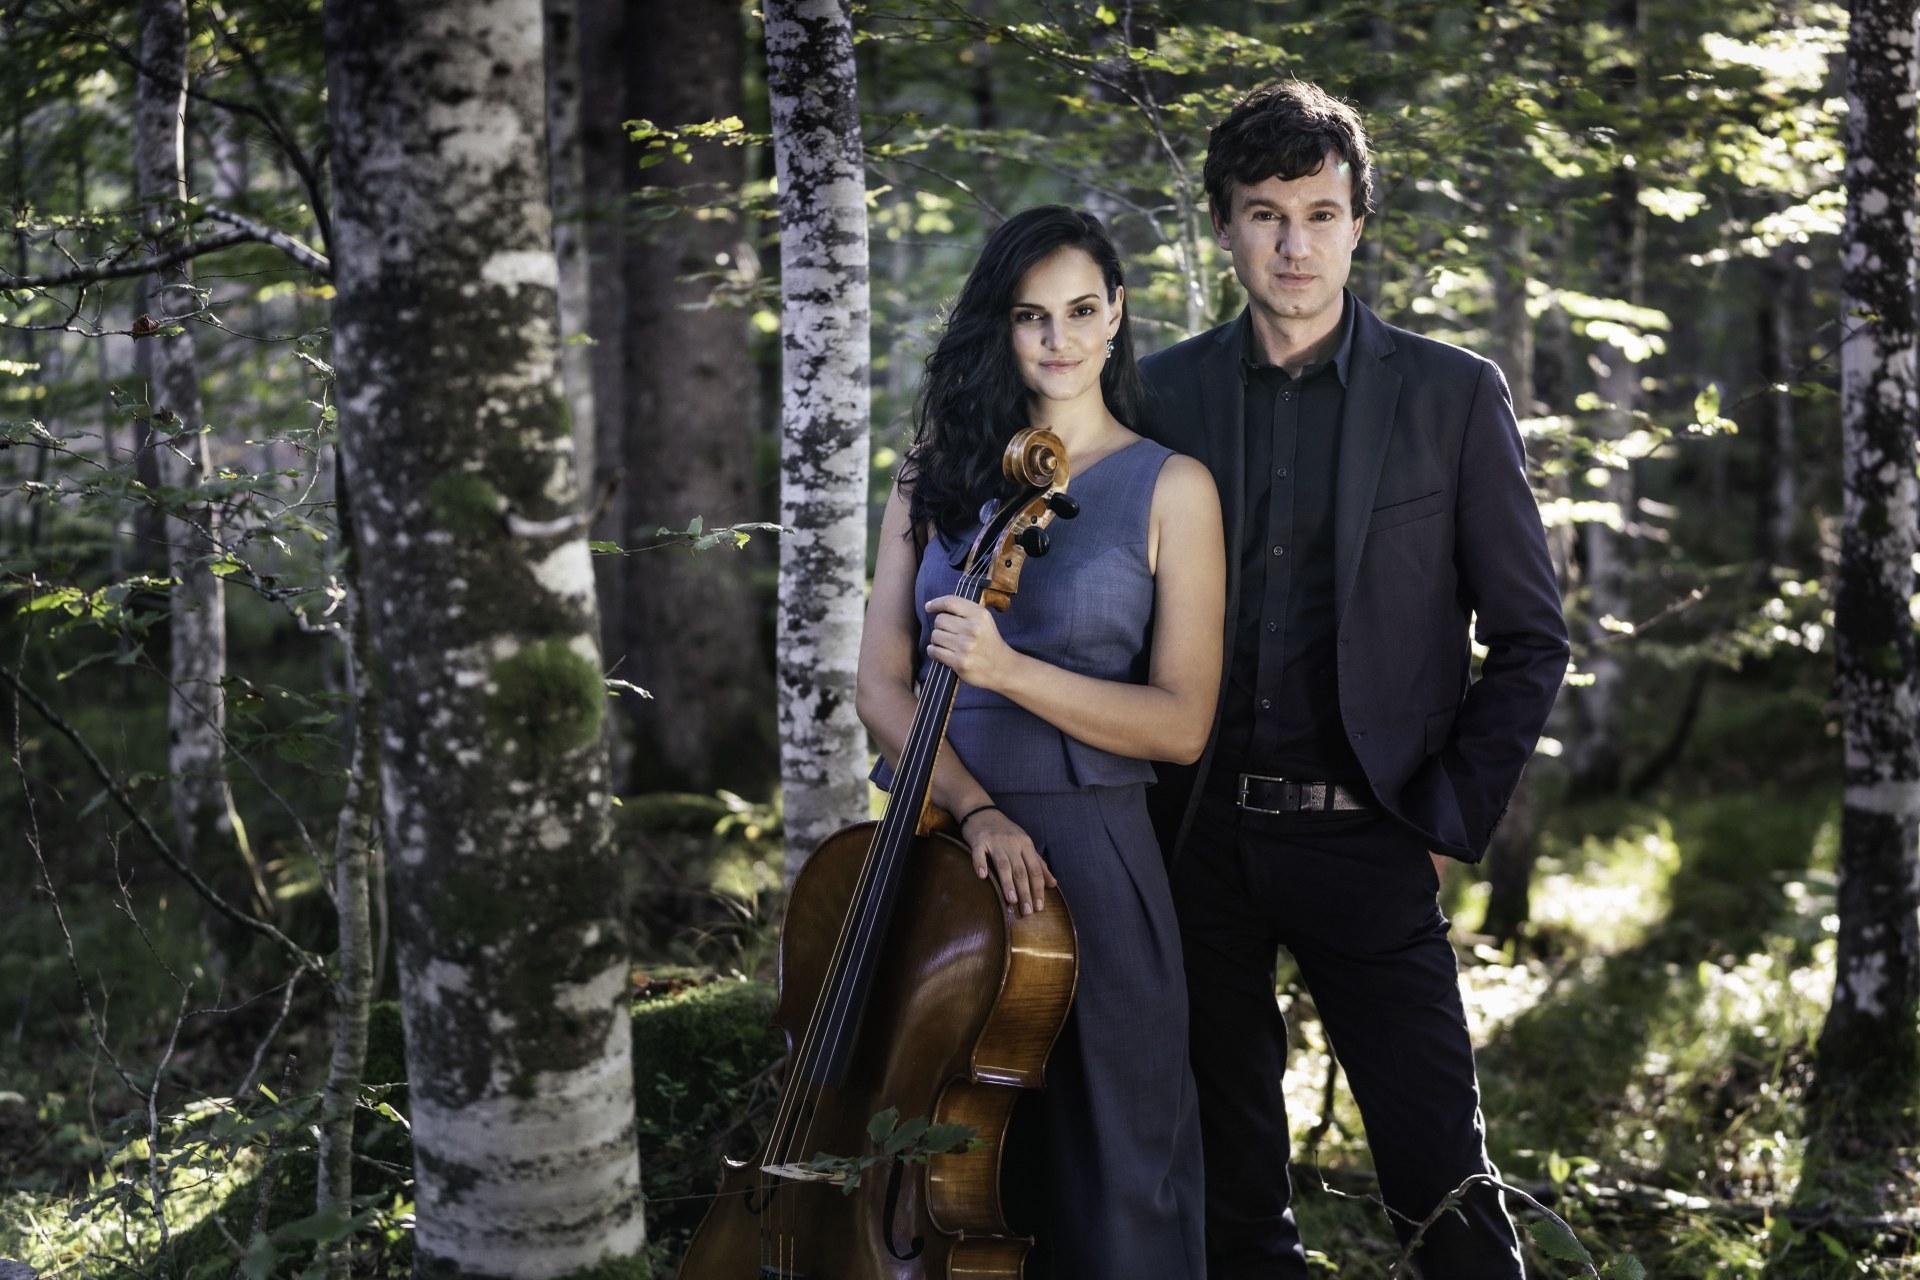 1407 Zeughauskonzerte Neuss 2020-2021 04 - Raphaela Gromes und Julian Riem - Foto Sammy Hart.jpg